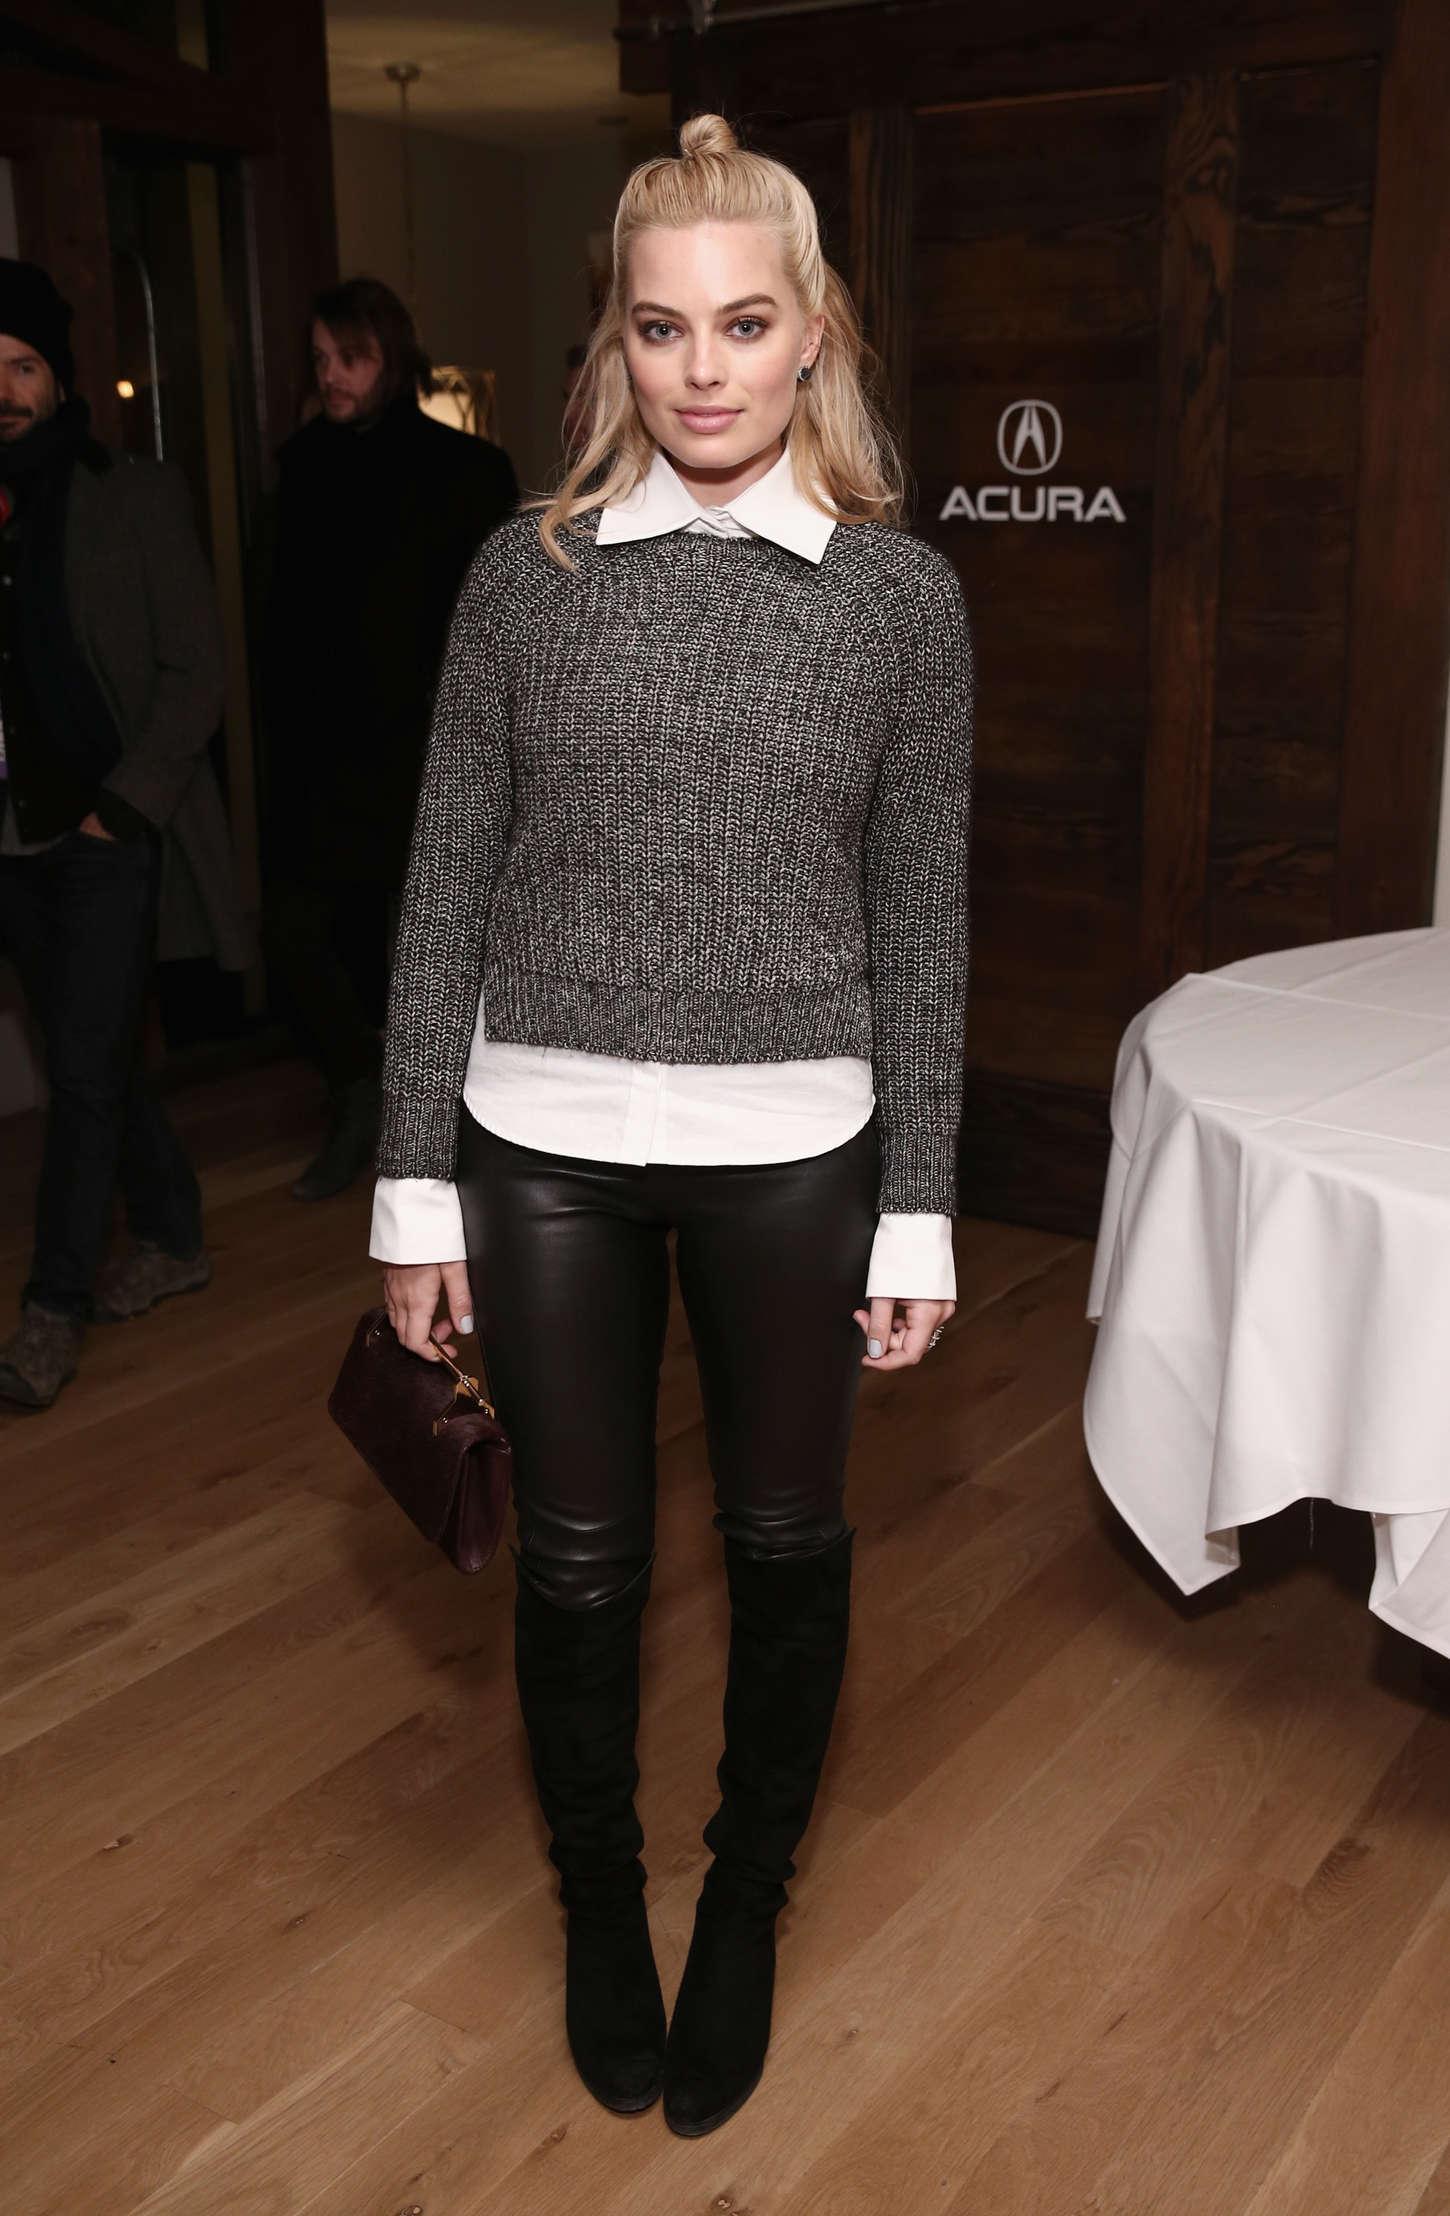 Margot Robbie attends the Z for Zachariah Dinner